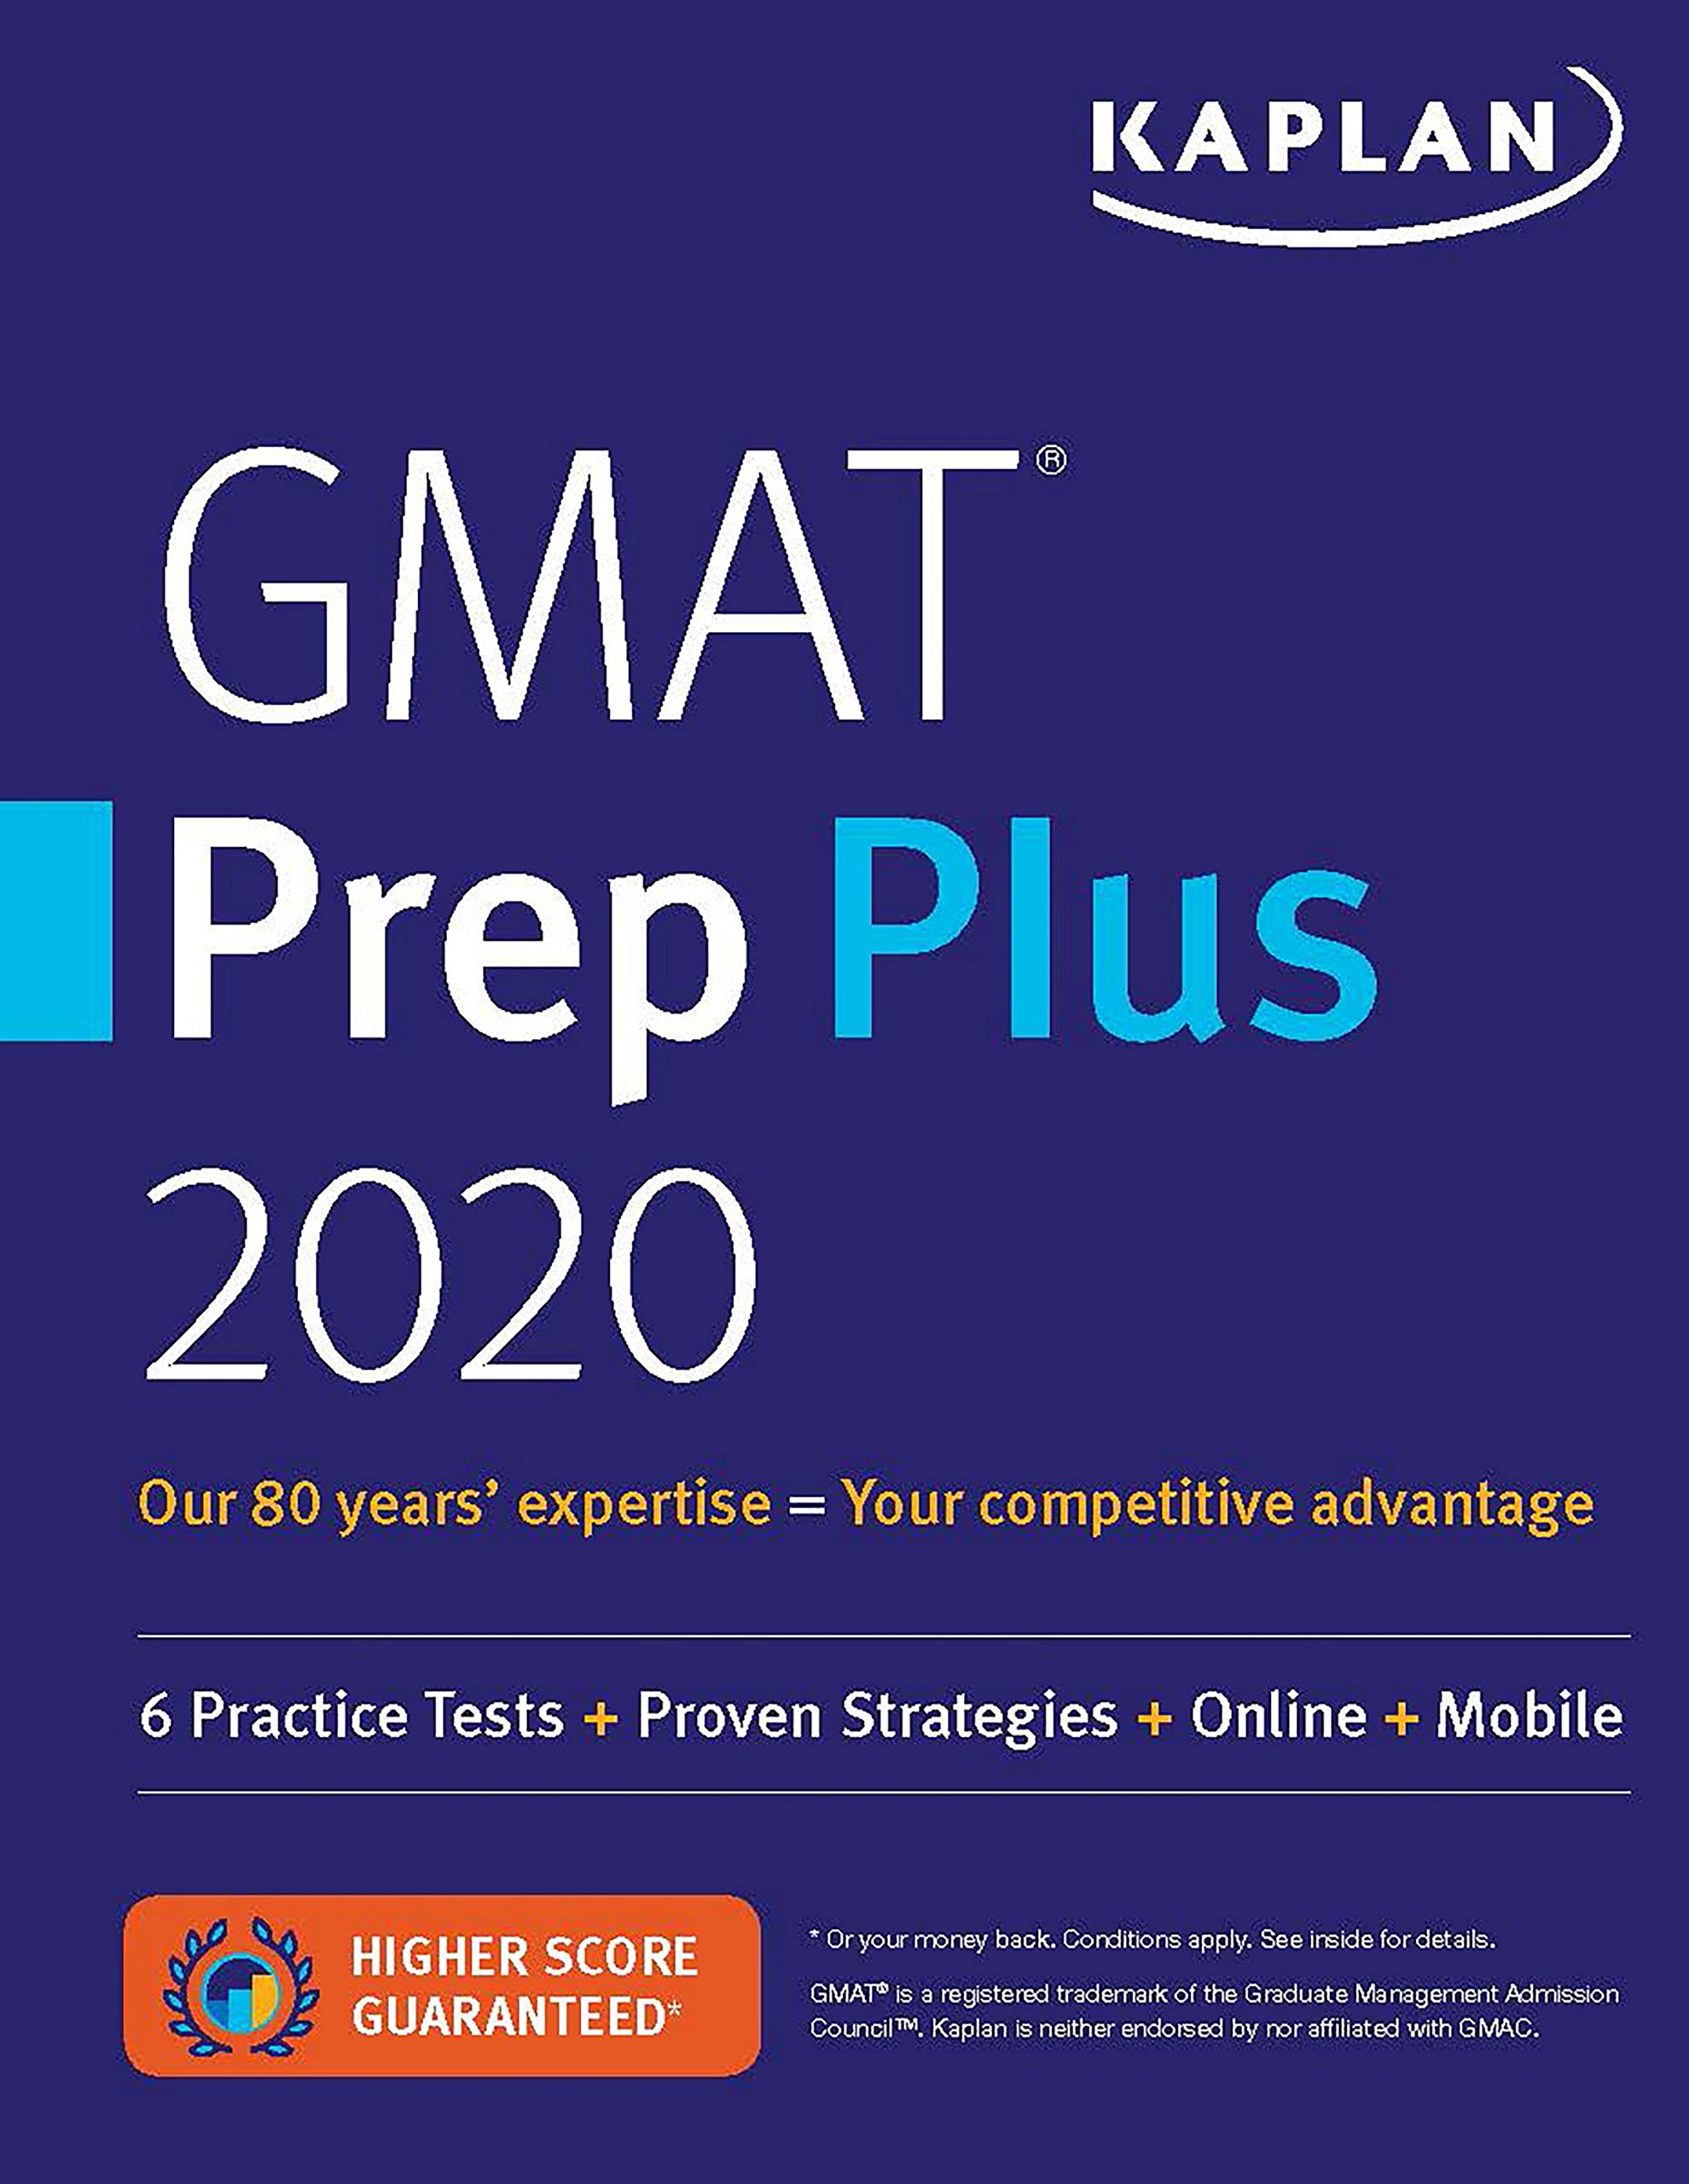 GMAT Prep Plus 2020: 6 Practice Tests + Proven Strategies + Online + Mobile (Kaplan Test Prep) by Kaplan Publishing